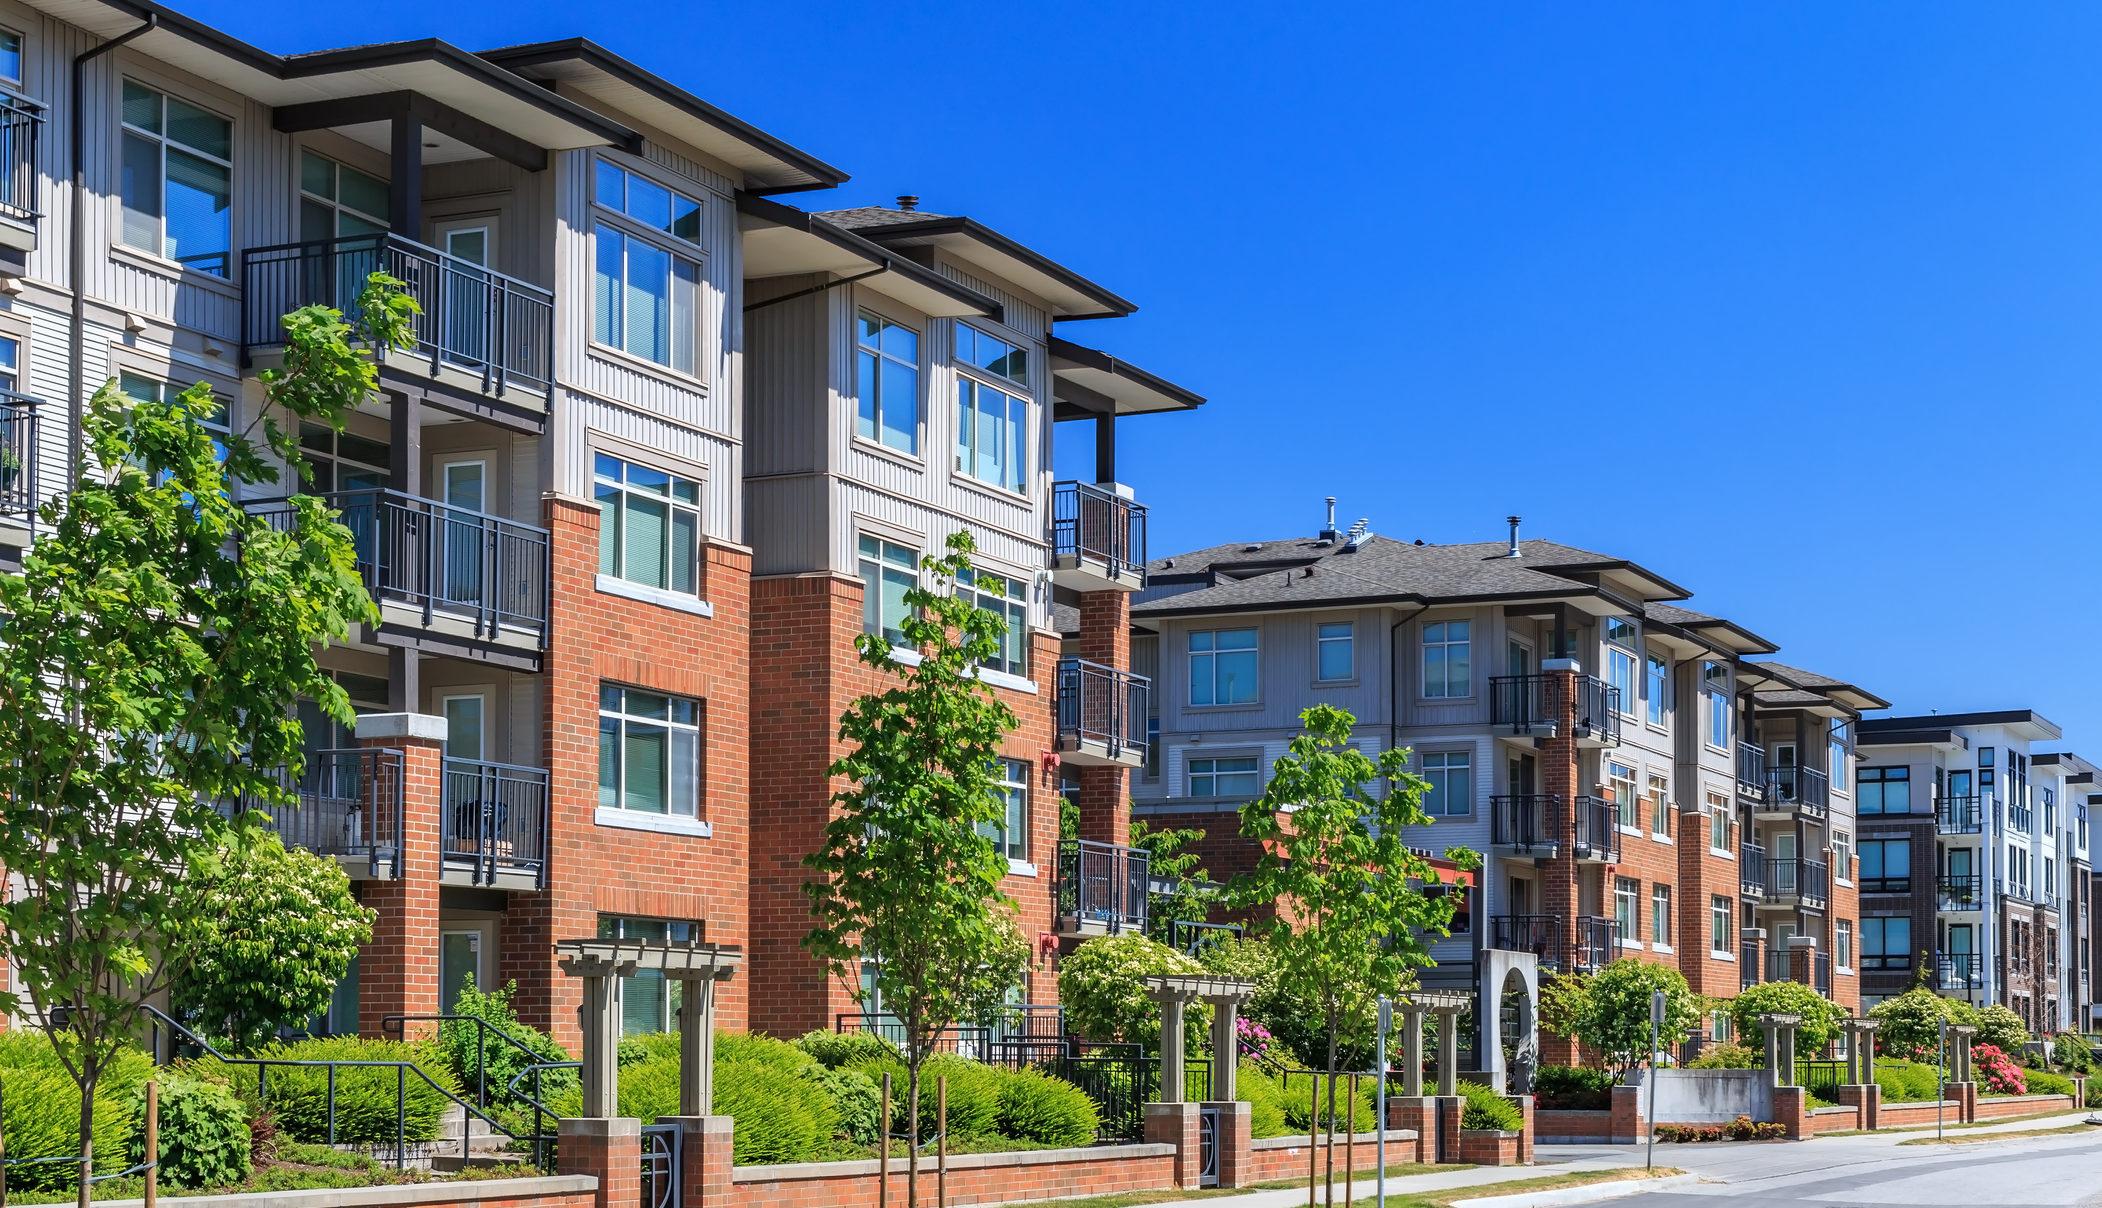 Commercial Real Estate Lawrenceville